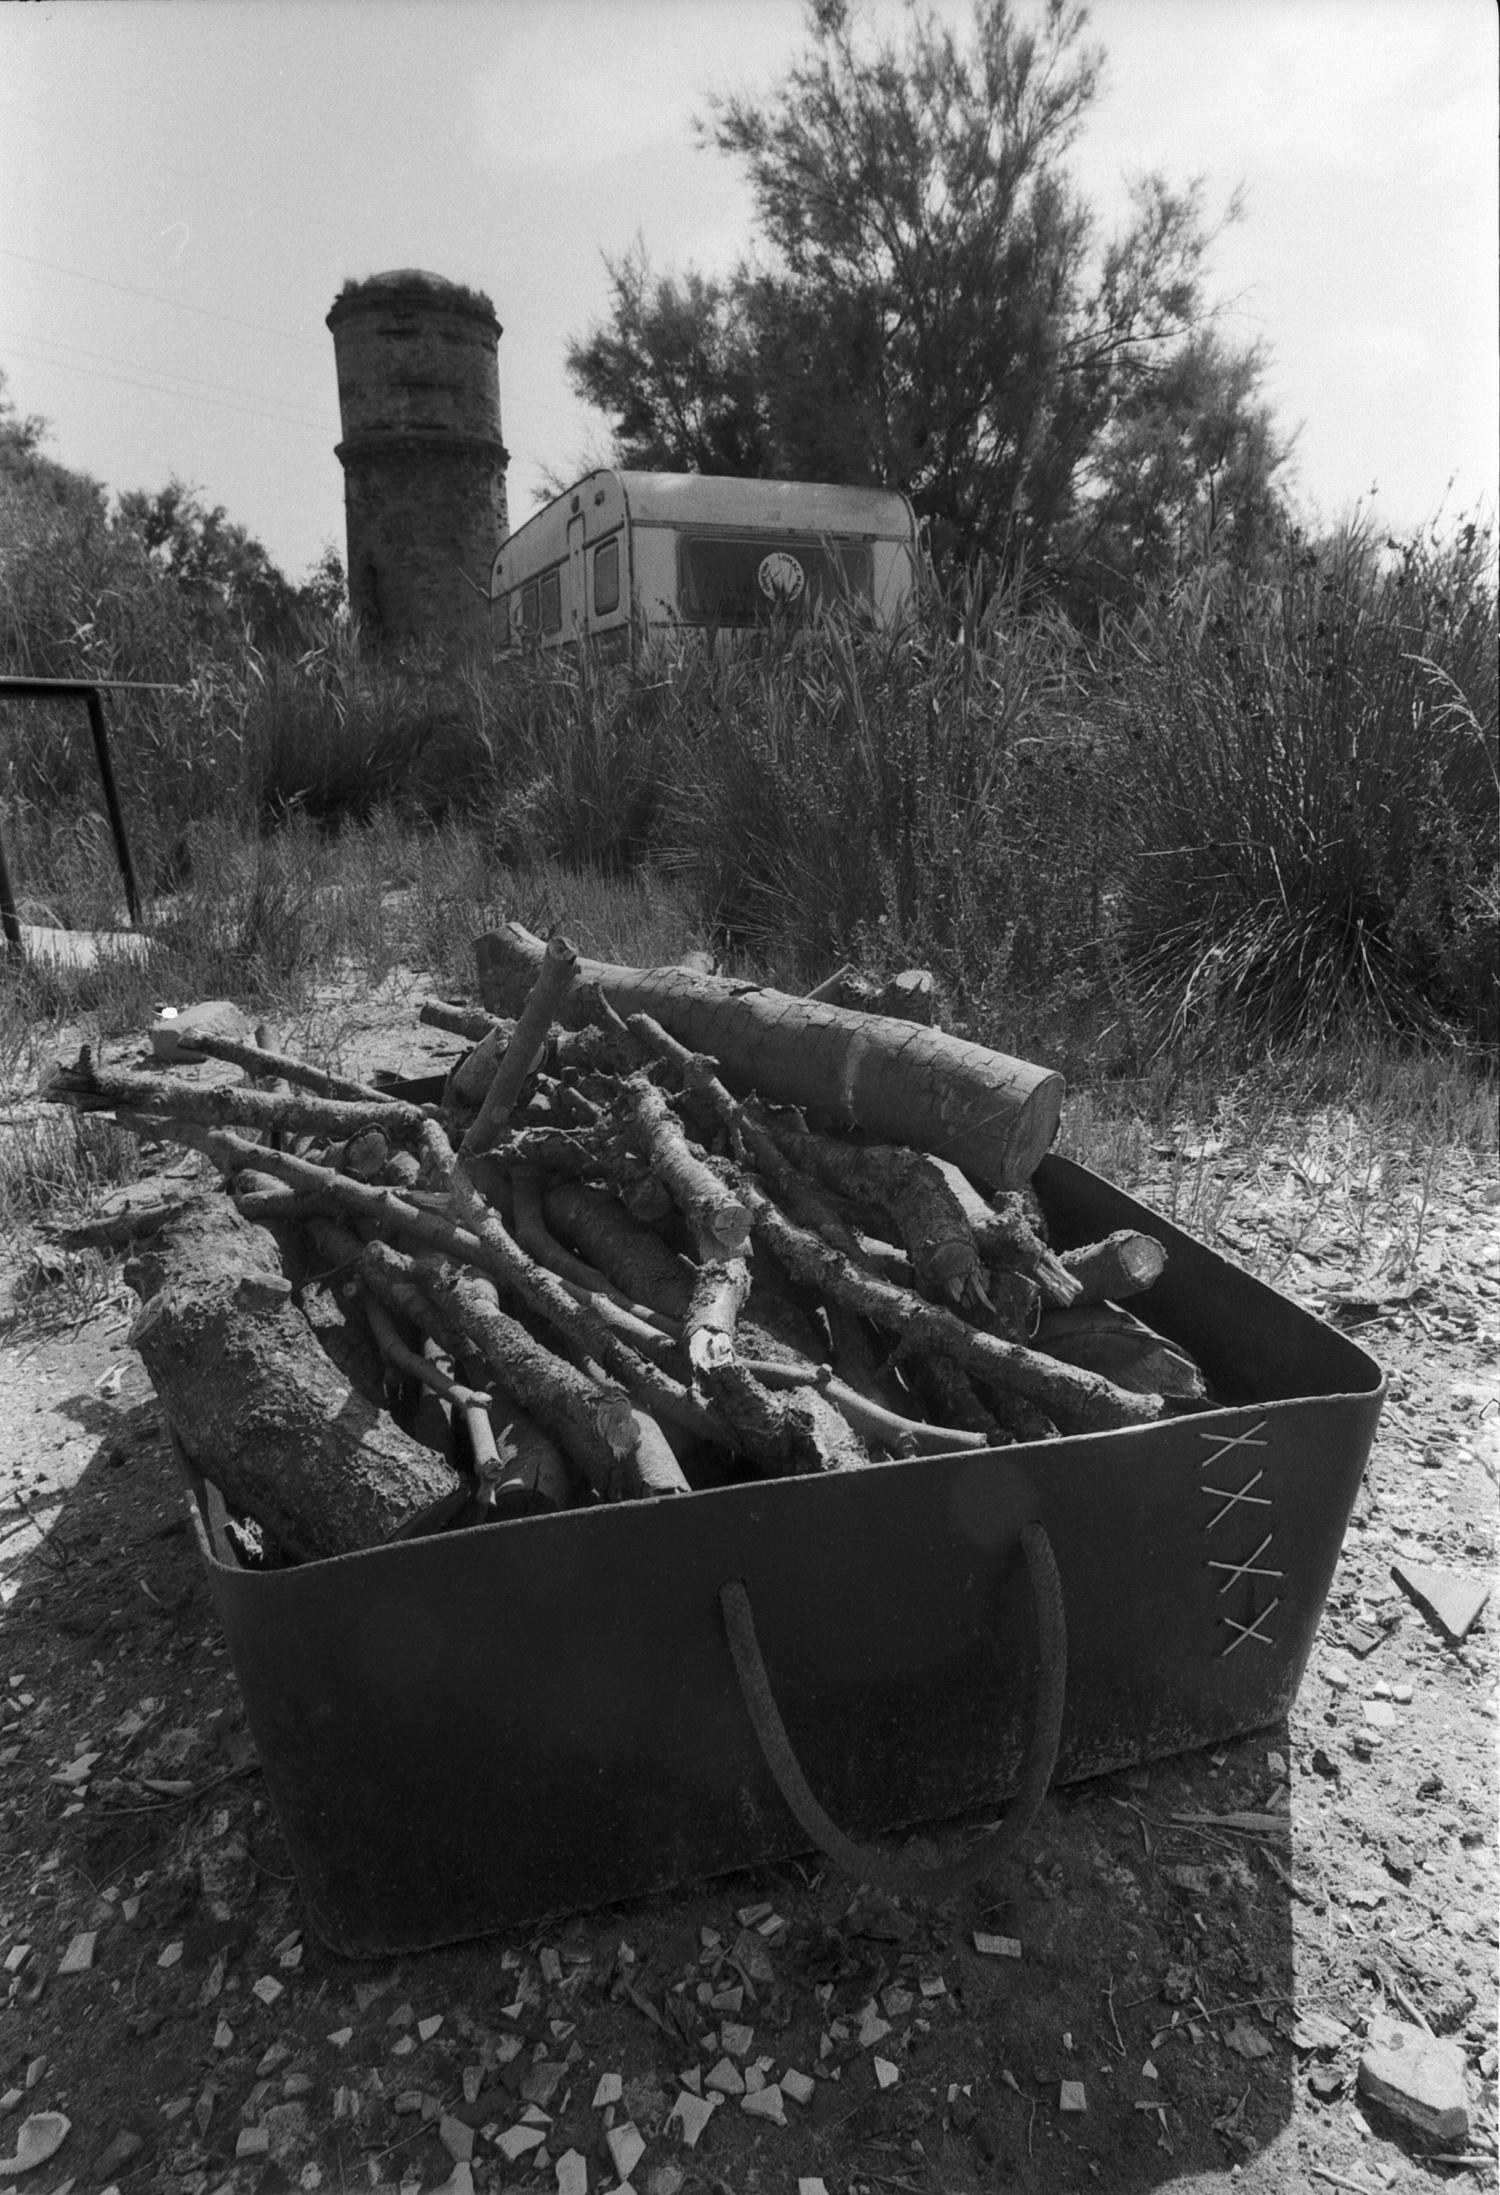 #144 Fire wood - Le Salina, Ferrara, Italy